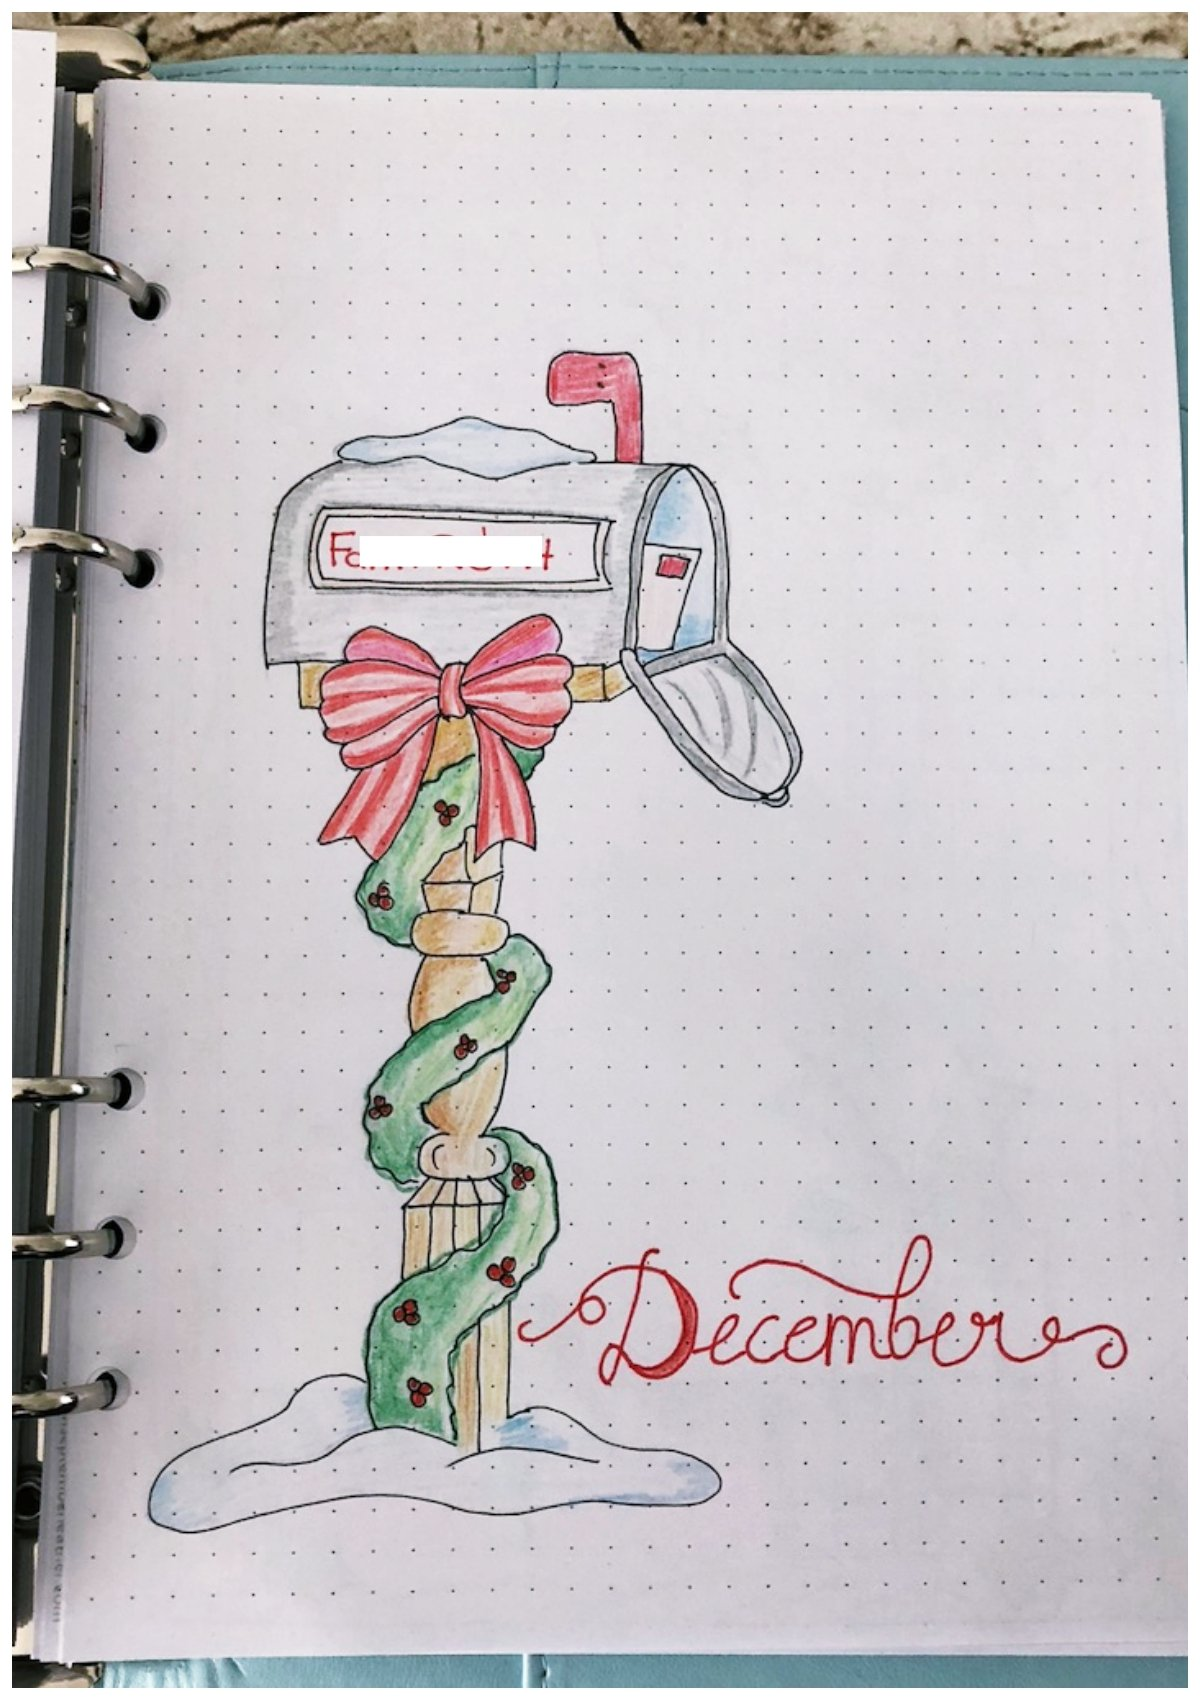 Bullet journal monthly cover December - itstartswithacoffee.com #bulletjournal #bulletjournaling #monthlyplanner #monthlycover #coverpages #December #bujo